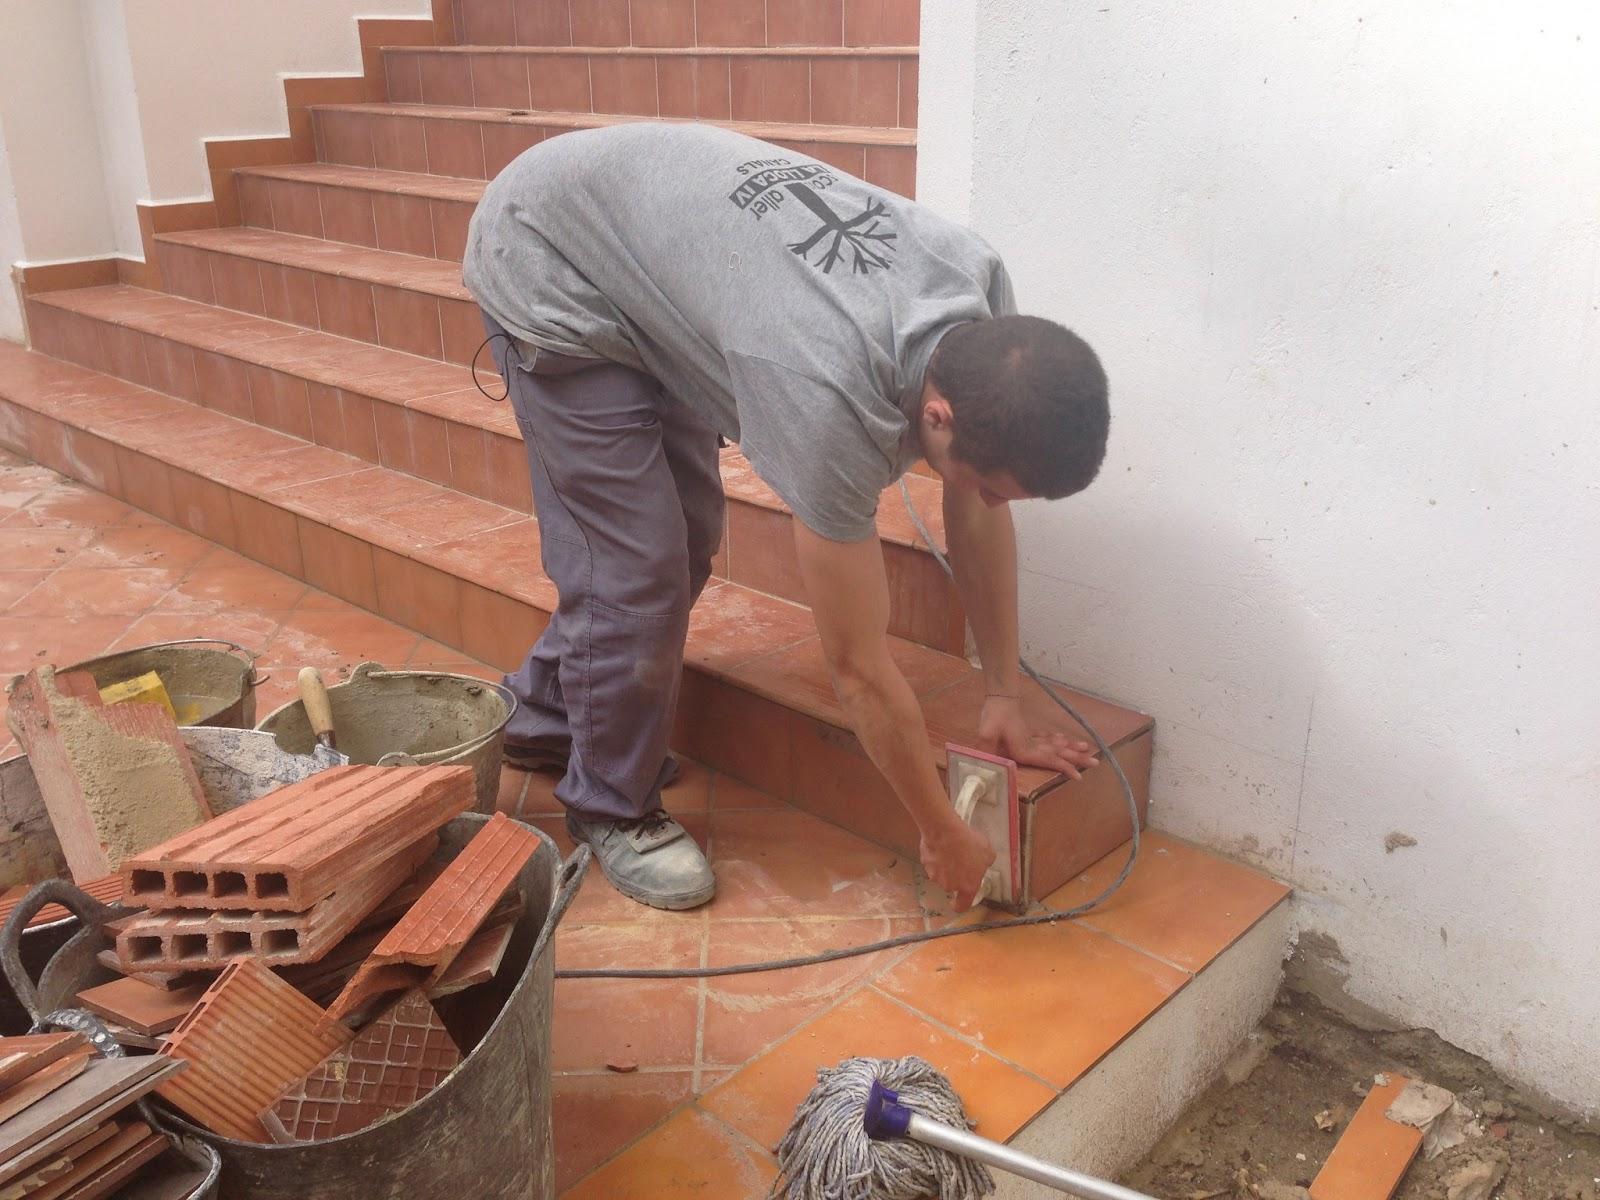 E t la lloca iv escalera terminada escuela taller la - Escaleras de ladrillo ...